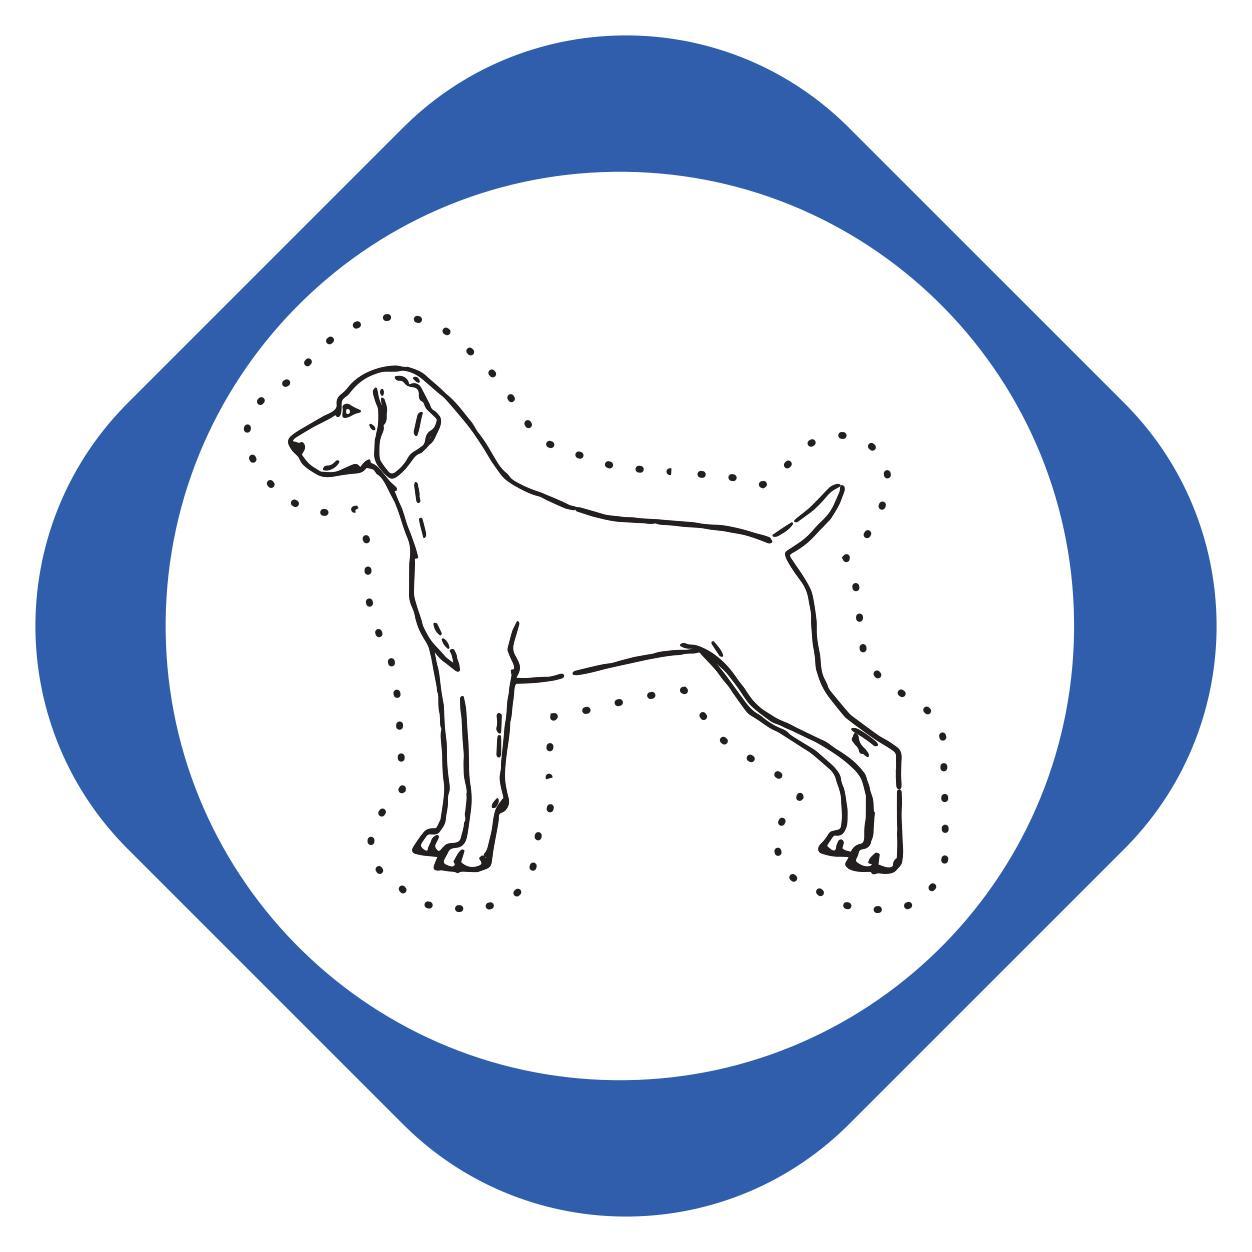 https://pets.alfa-vet.com/image/catalog/avatars/0024.jpg